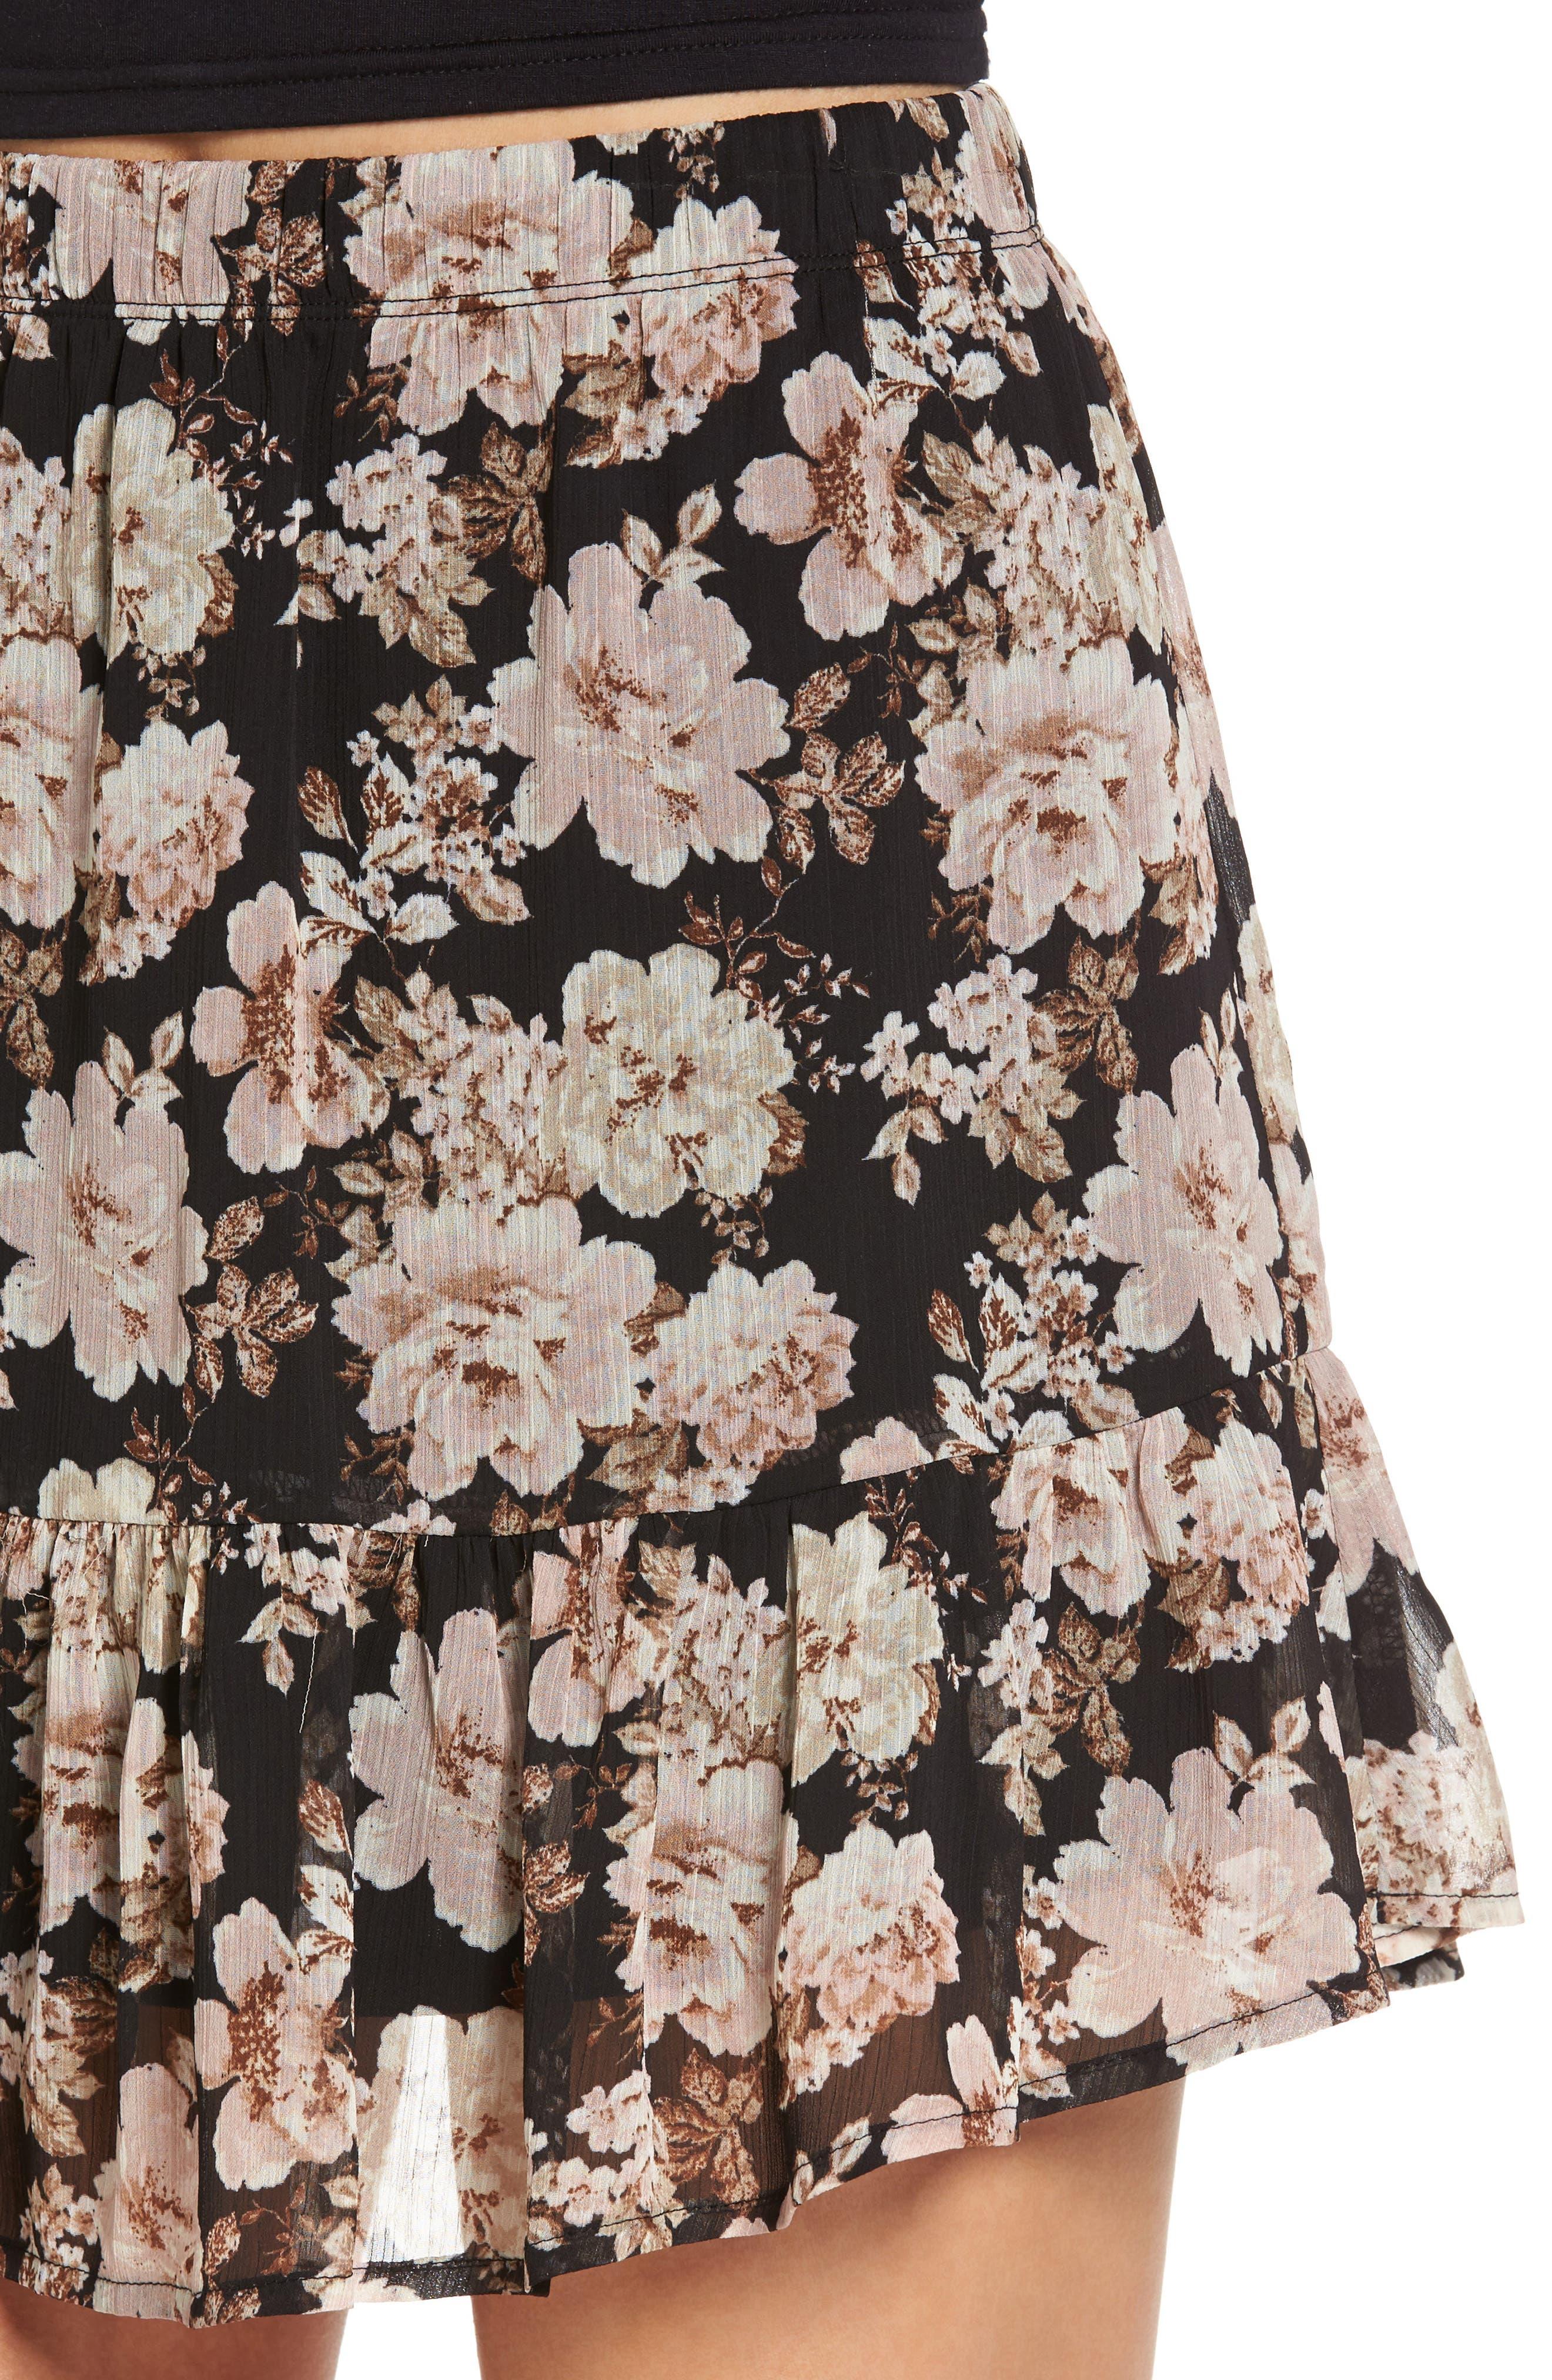 Floral Print Drop Waist Skirt,                             Alternate thumbnail 4, color,                             001